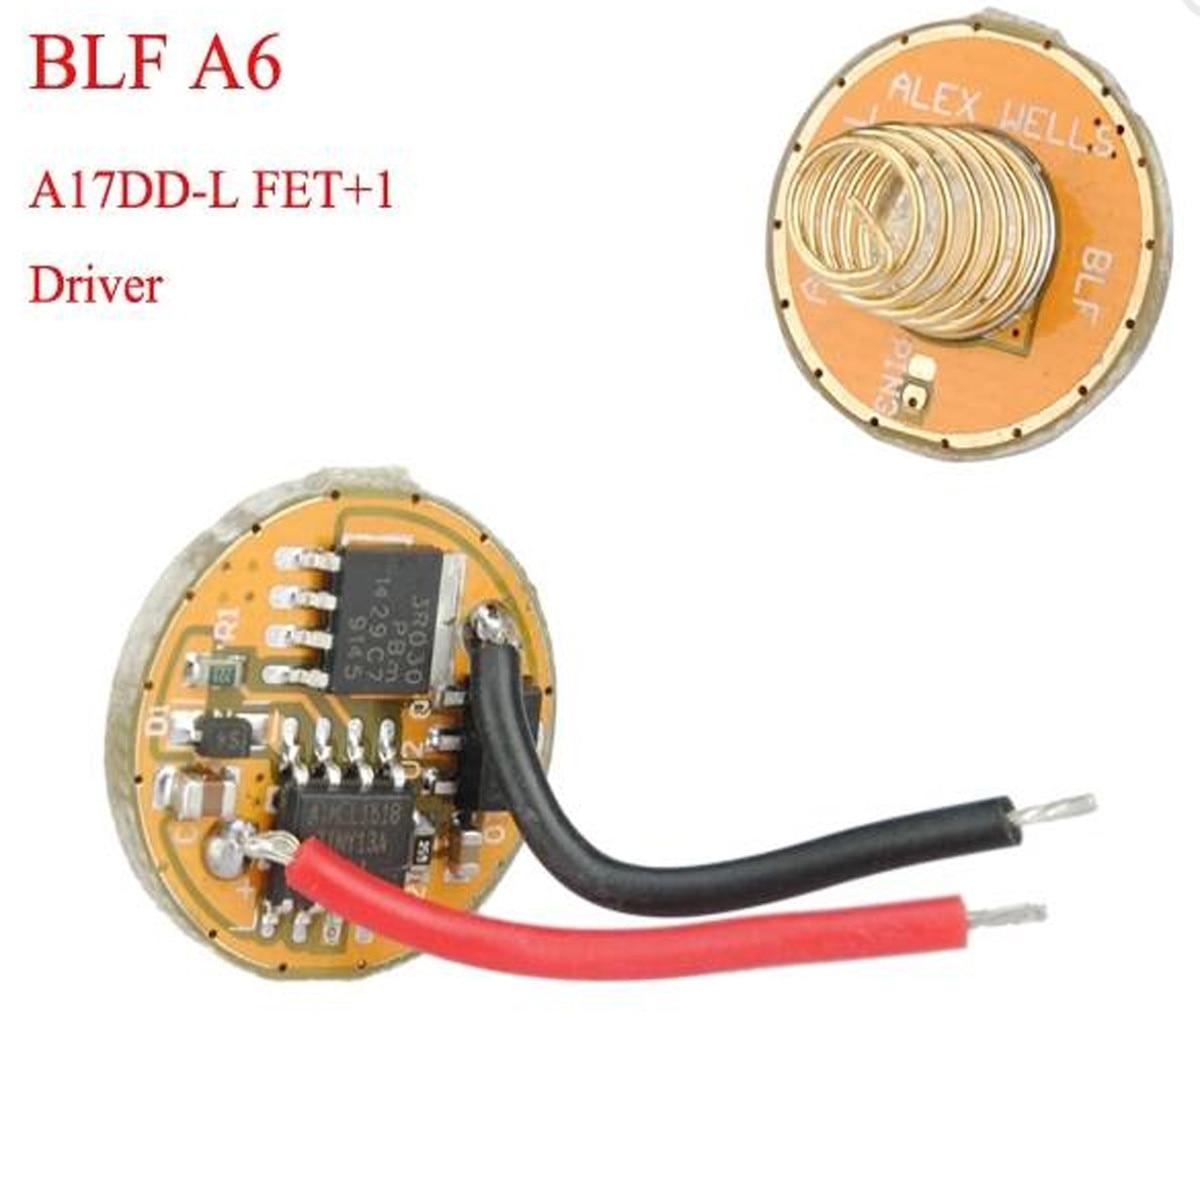 Astrolux S1 BLF A6 A17DD-L FET+1 2.8-4.35v 7/4 Modes LED Flashlight Driver